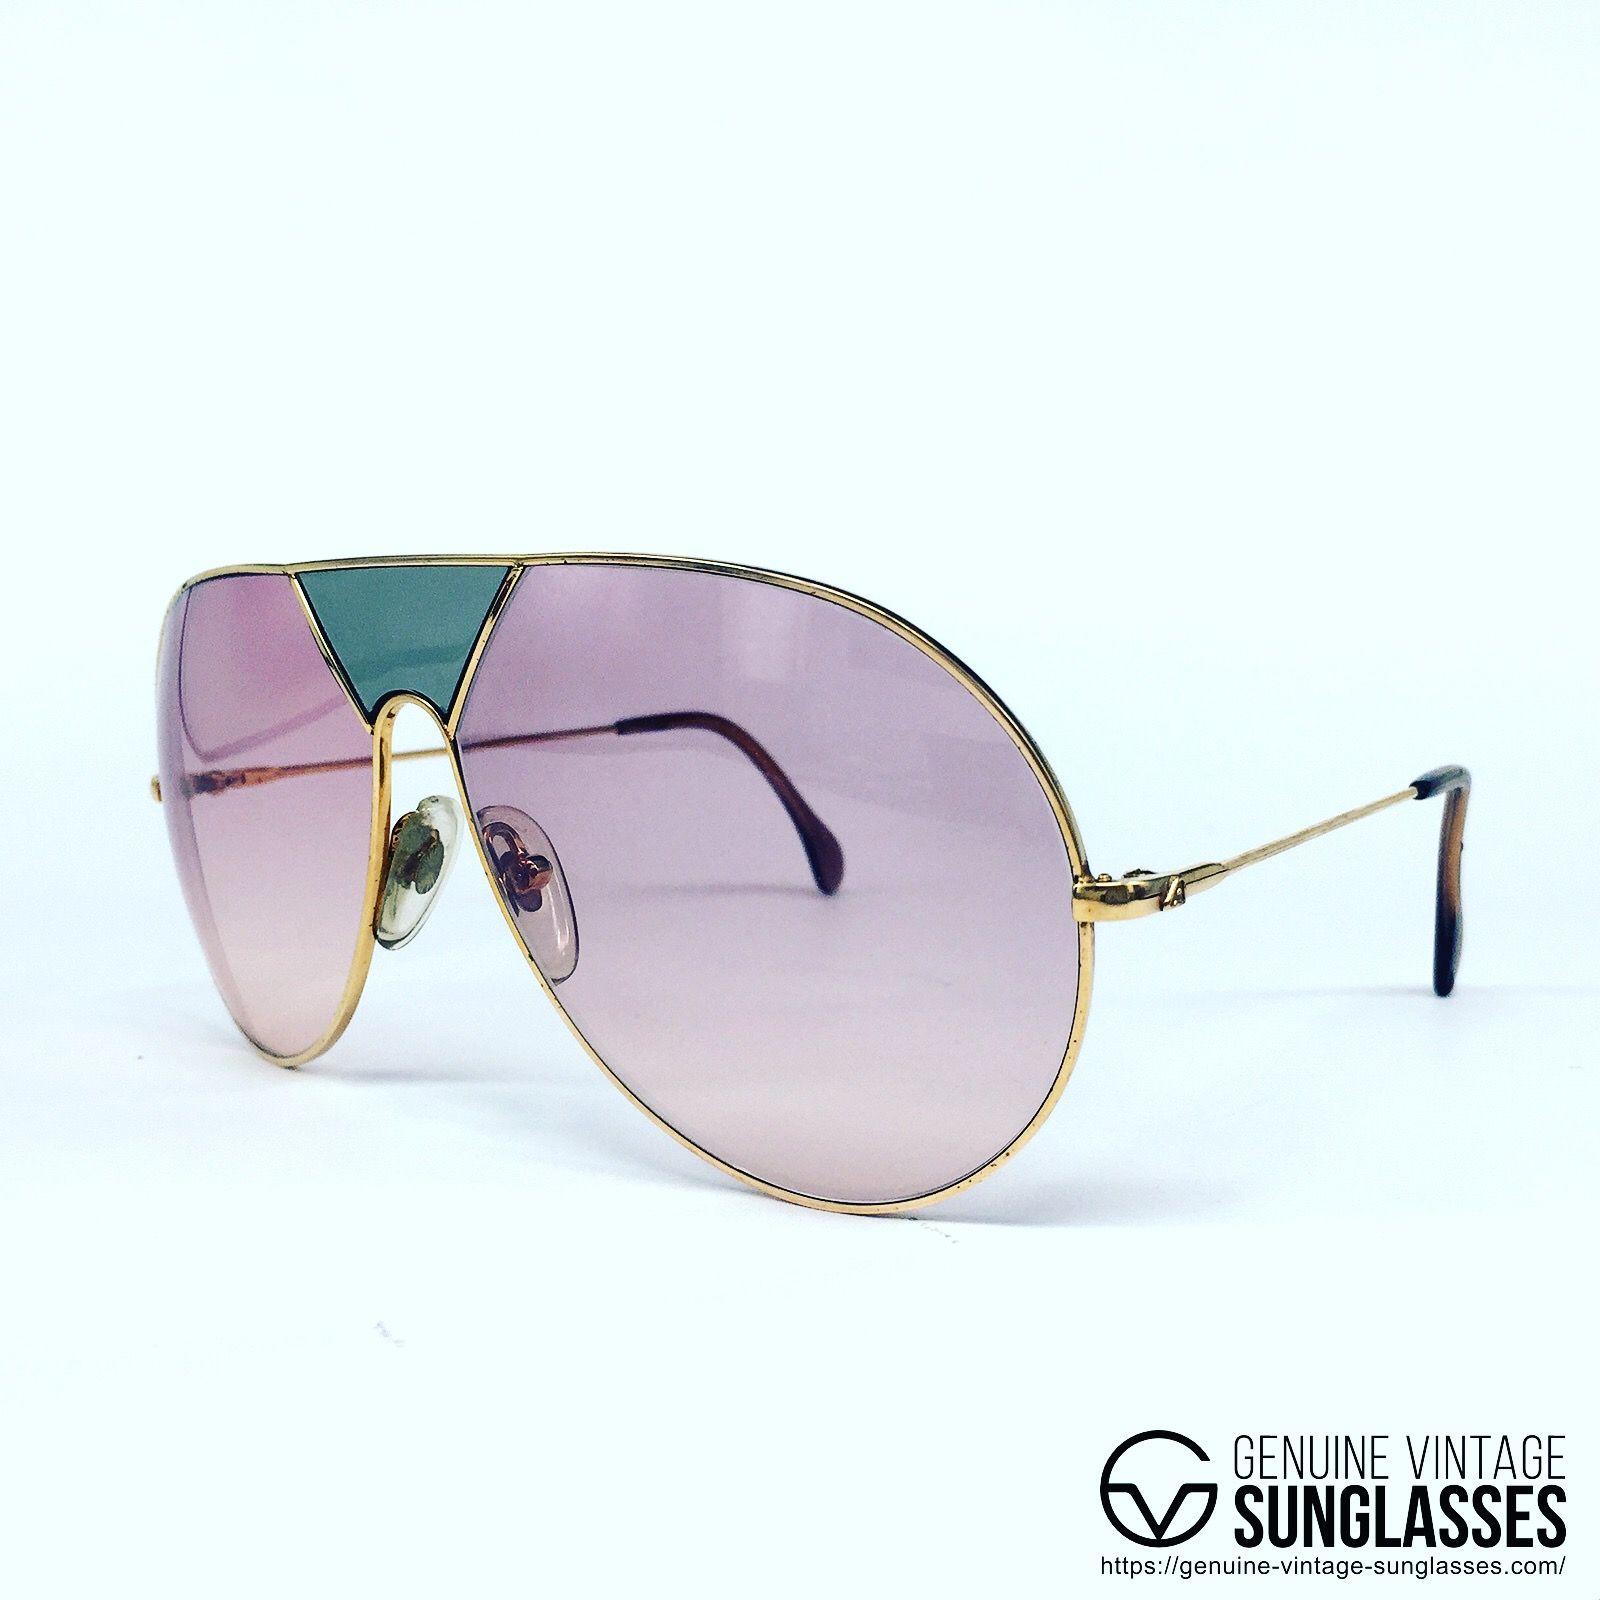 2b5c5ecbedaf3 Alpina TR3 Gold  genuine vintage sunglasses  alpina  alpinasports   vintagefashion  sunglasses